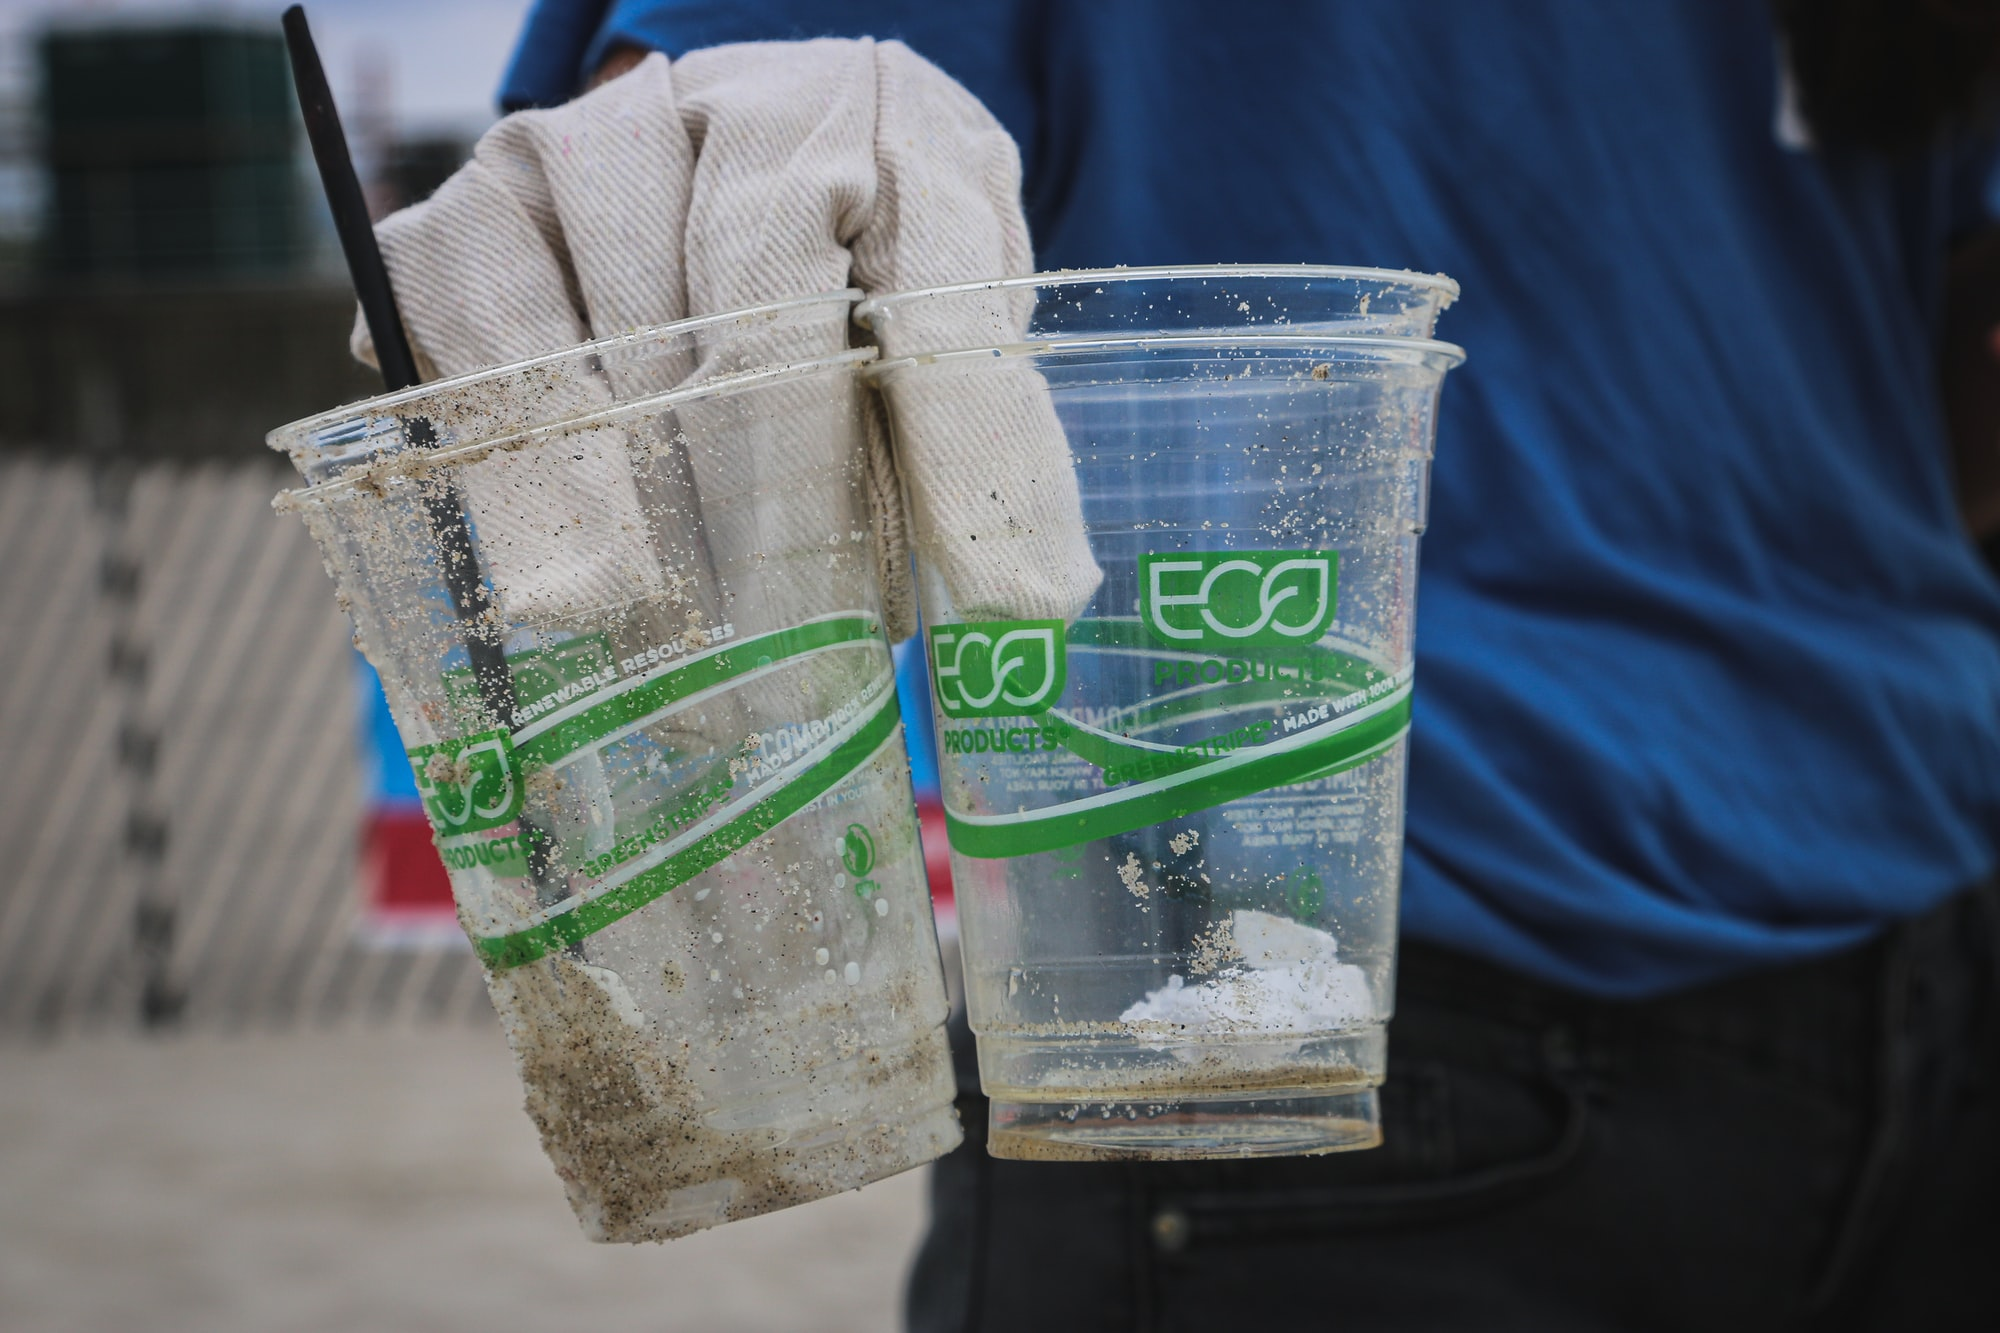 29: Greenwashing